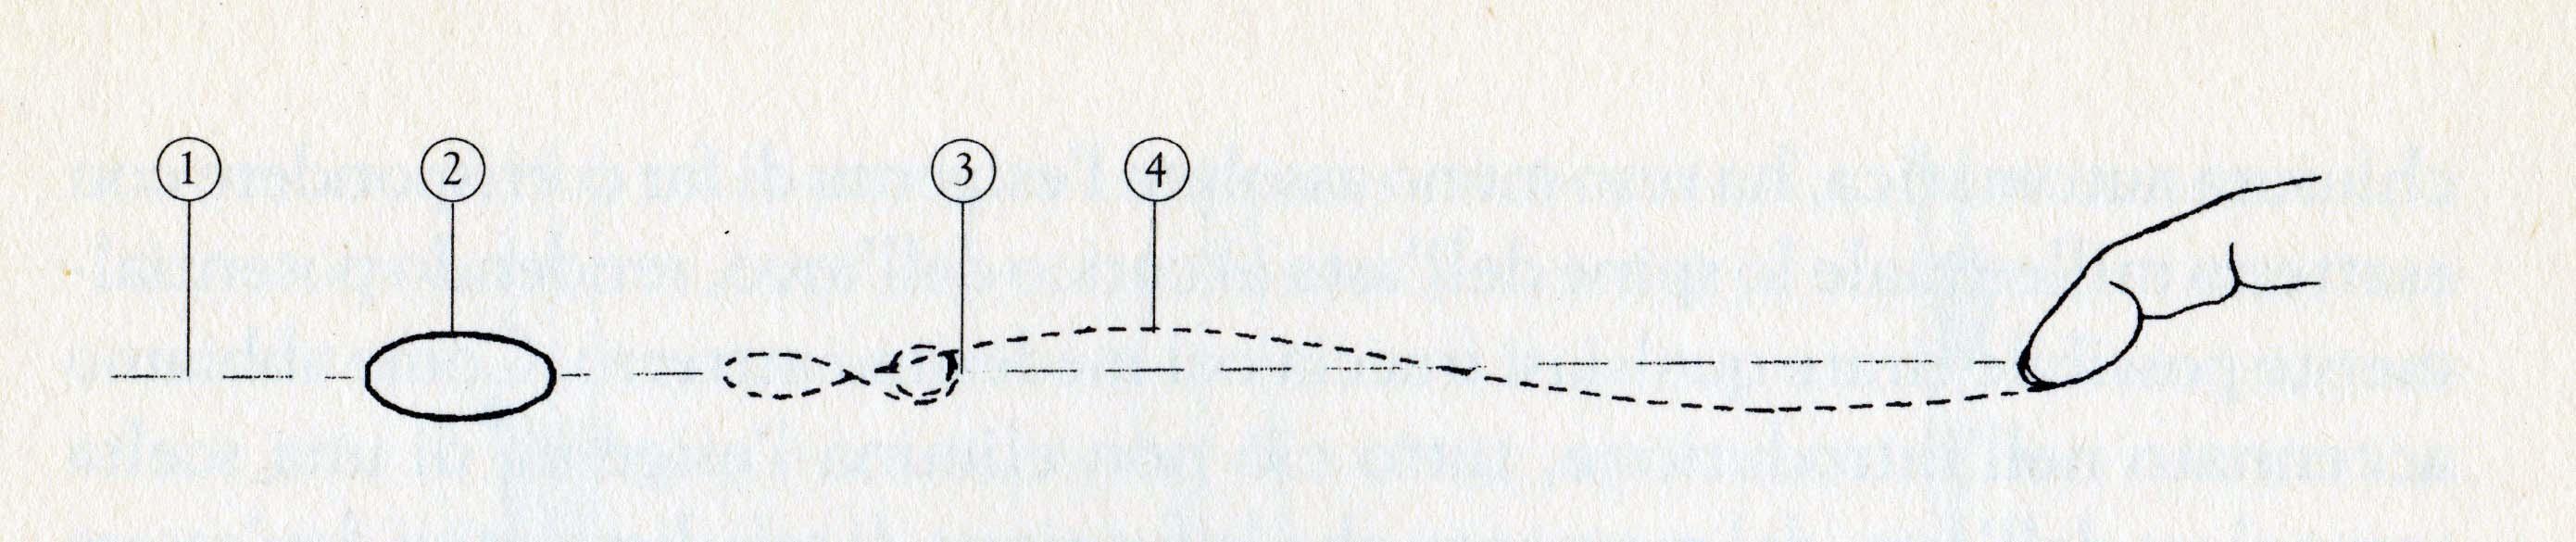 percorso-corda